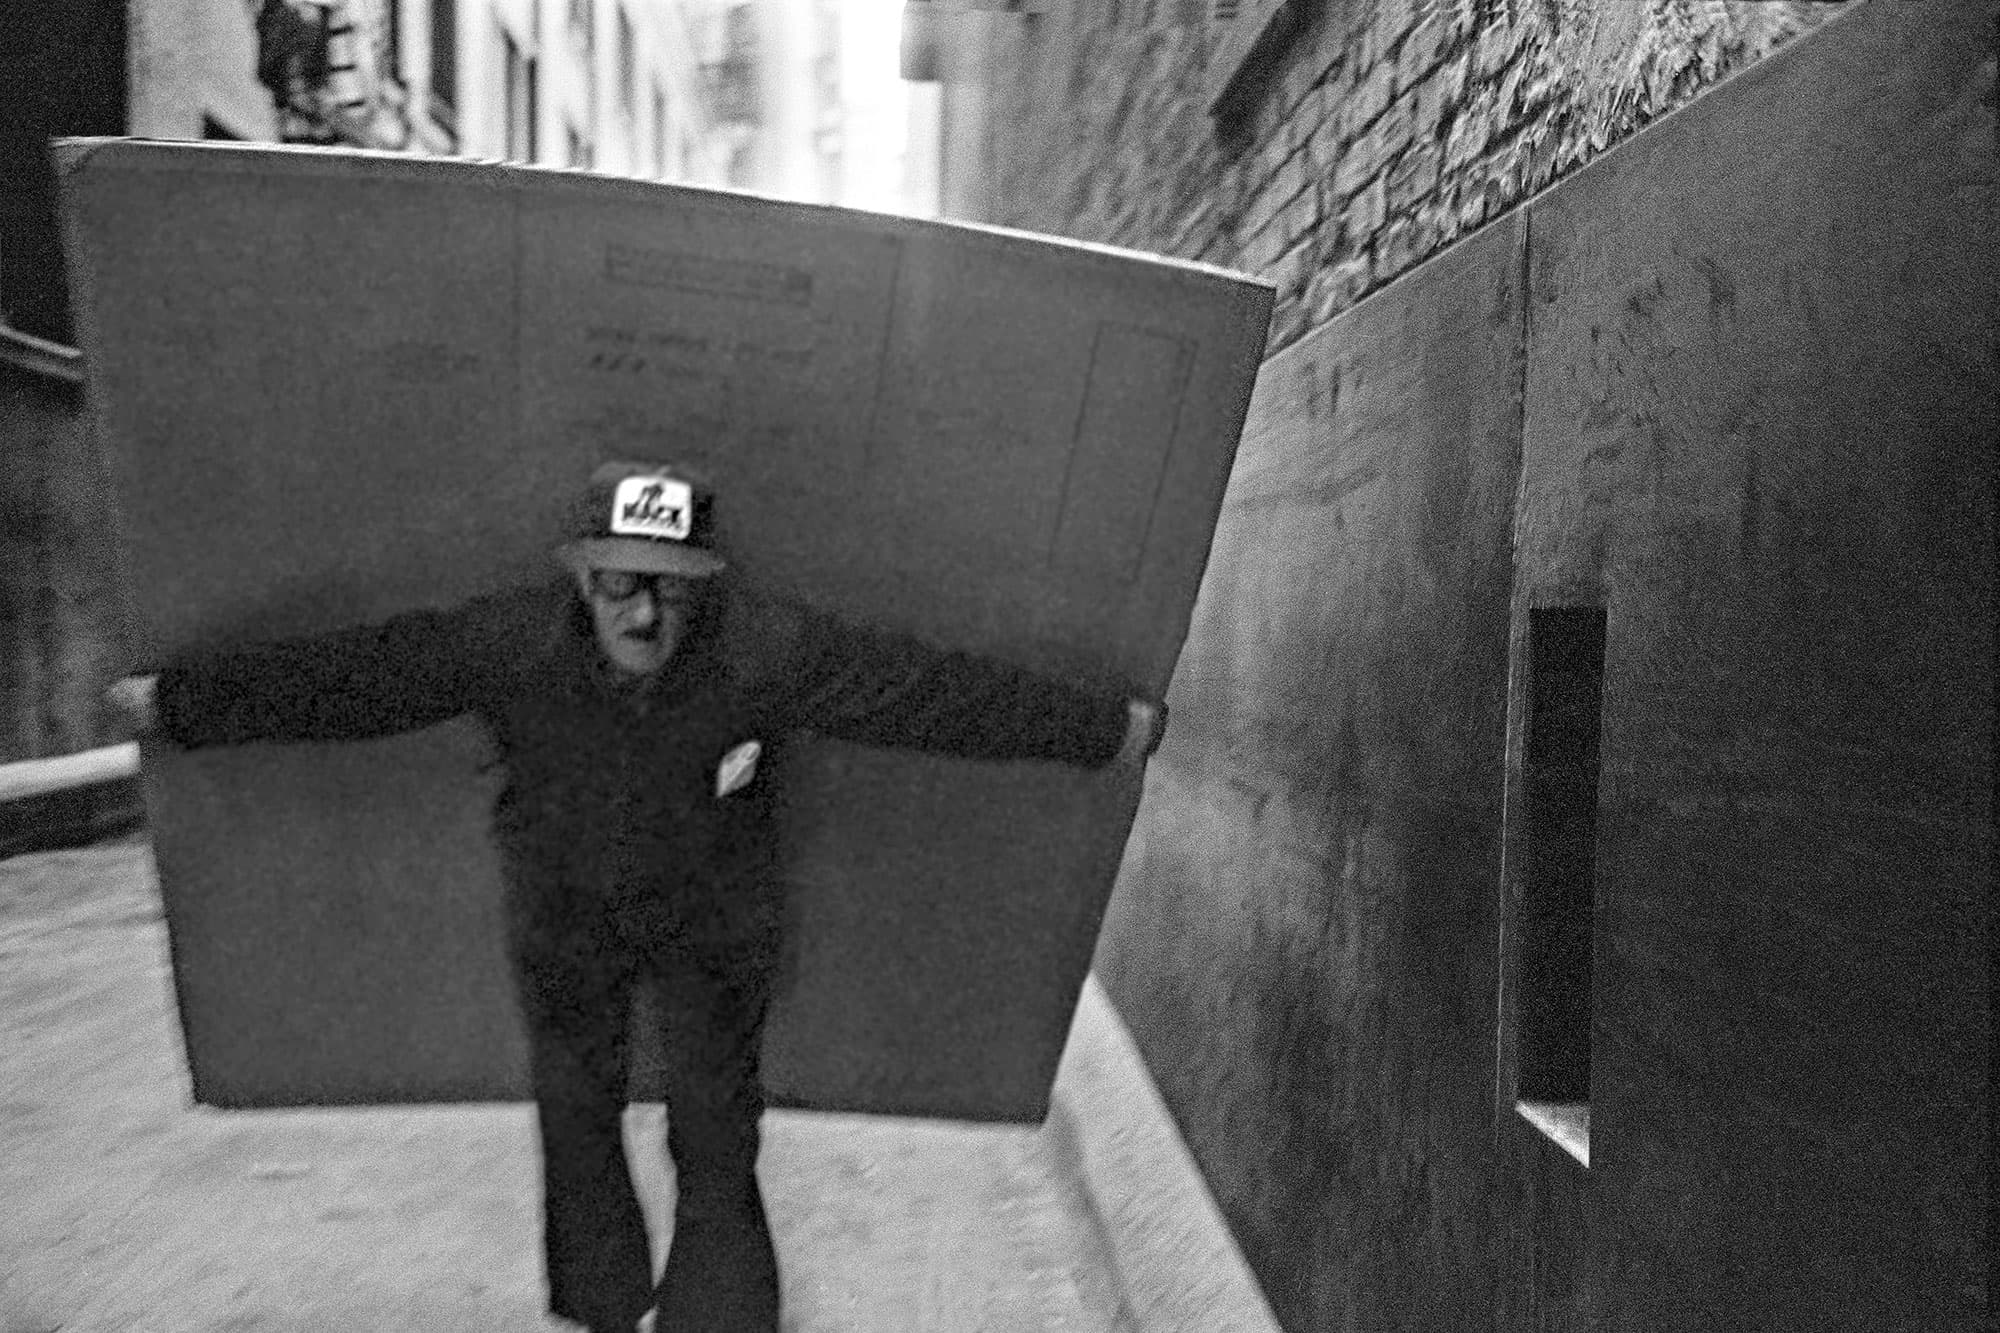 Mack-1979 arthur lazar